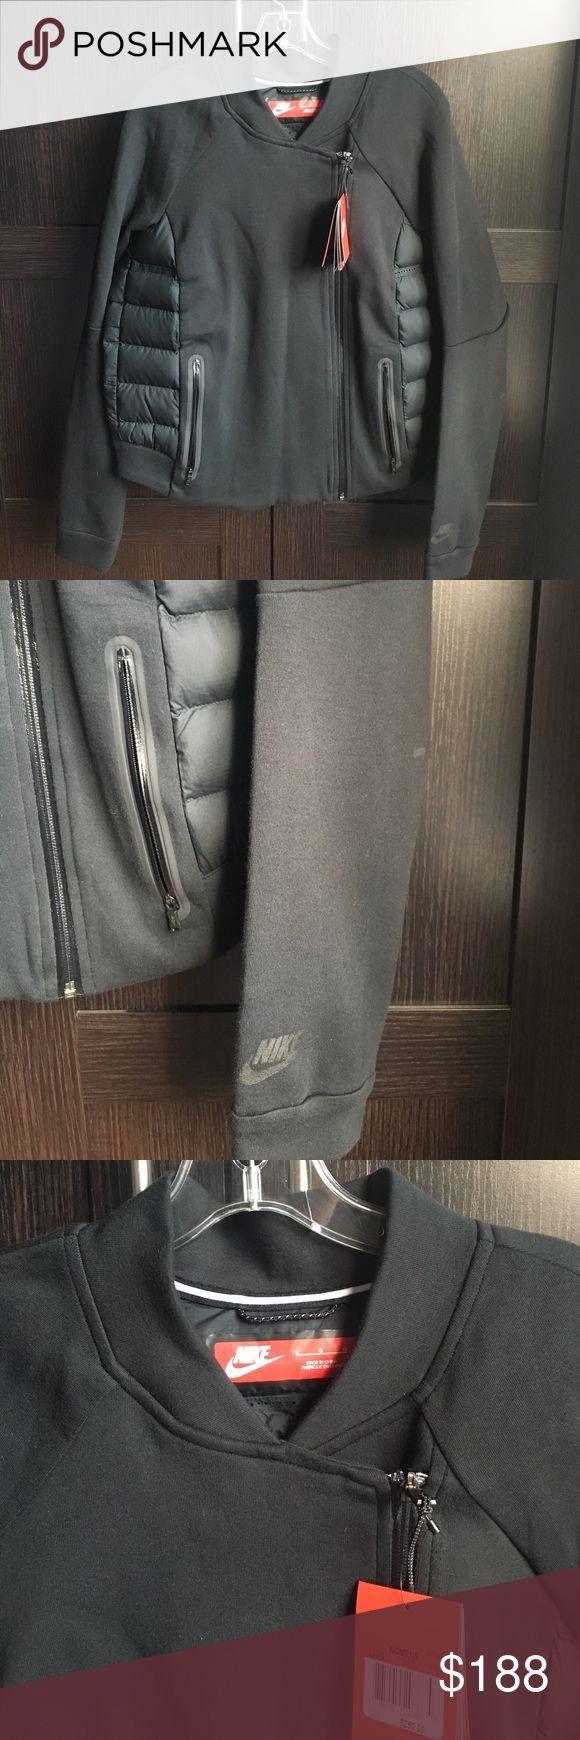 Nike Jacket Womens Nike jacket style N 683938. Light weight. Black. Modern design. Highly Breathable. Warmth. Nike Jackets & Coats Utility Jackets